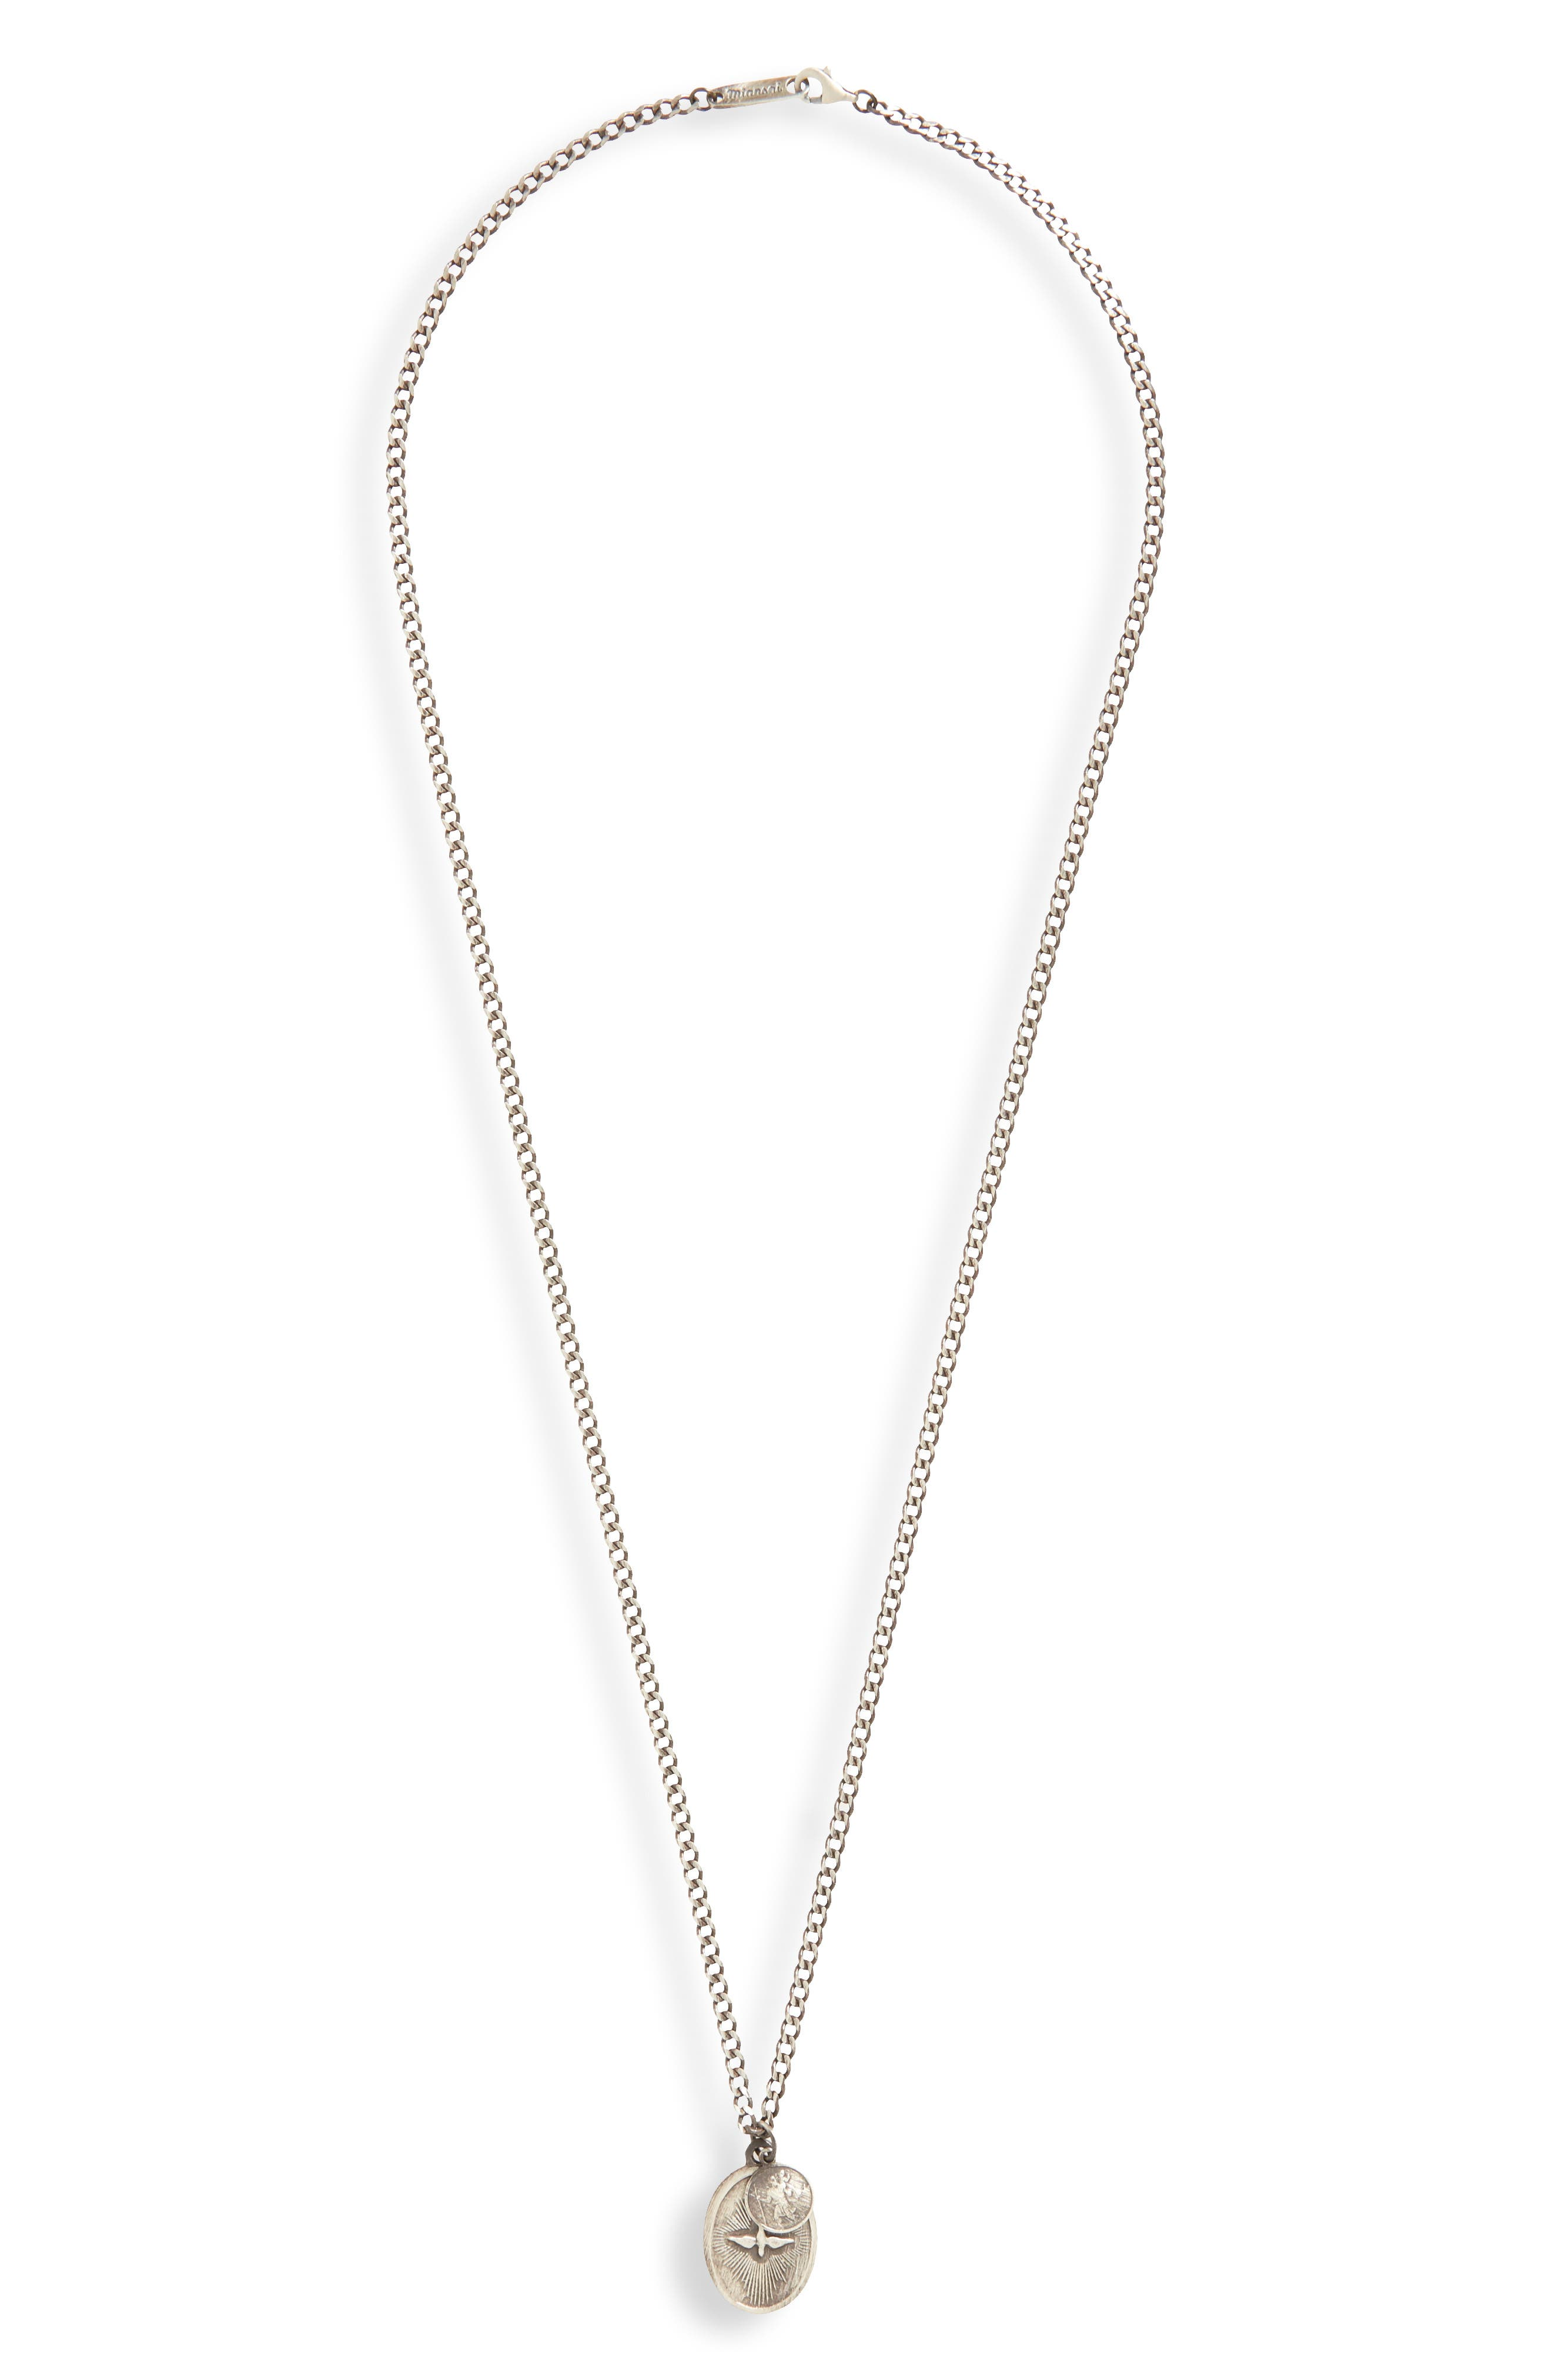 Main Image - Miansai Dove Pendant Necklace